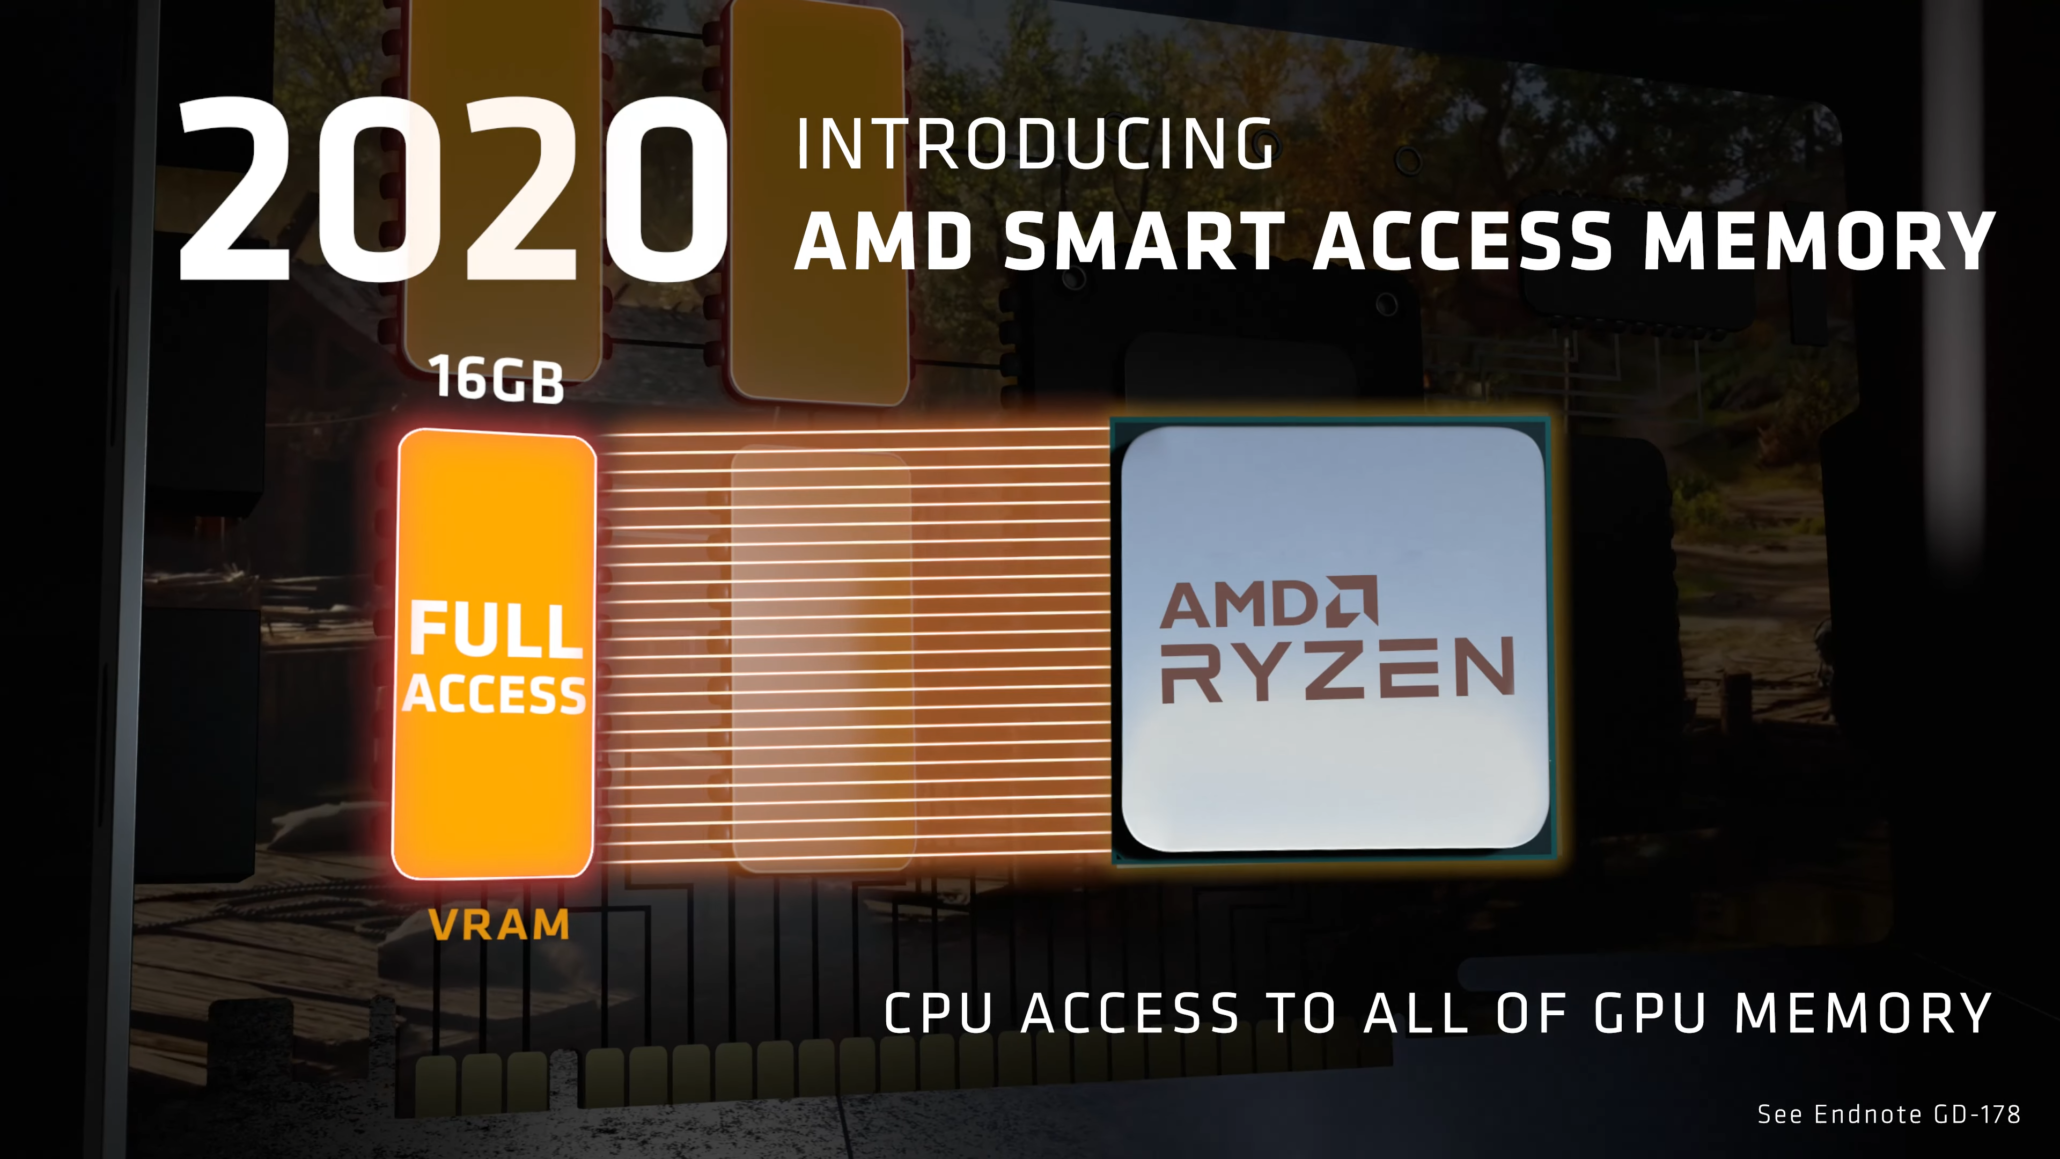 MSI Menunjukkan AMD Smart Access Memory yang Berjalan pada CPU AMD Ryzen 3000 & Ryzen 4000G Dengan NVIDIA GeForce RTX 30 GPUs